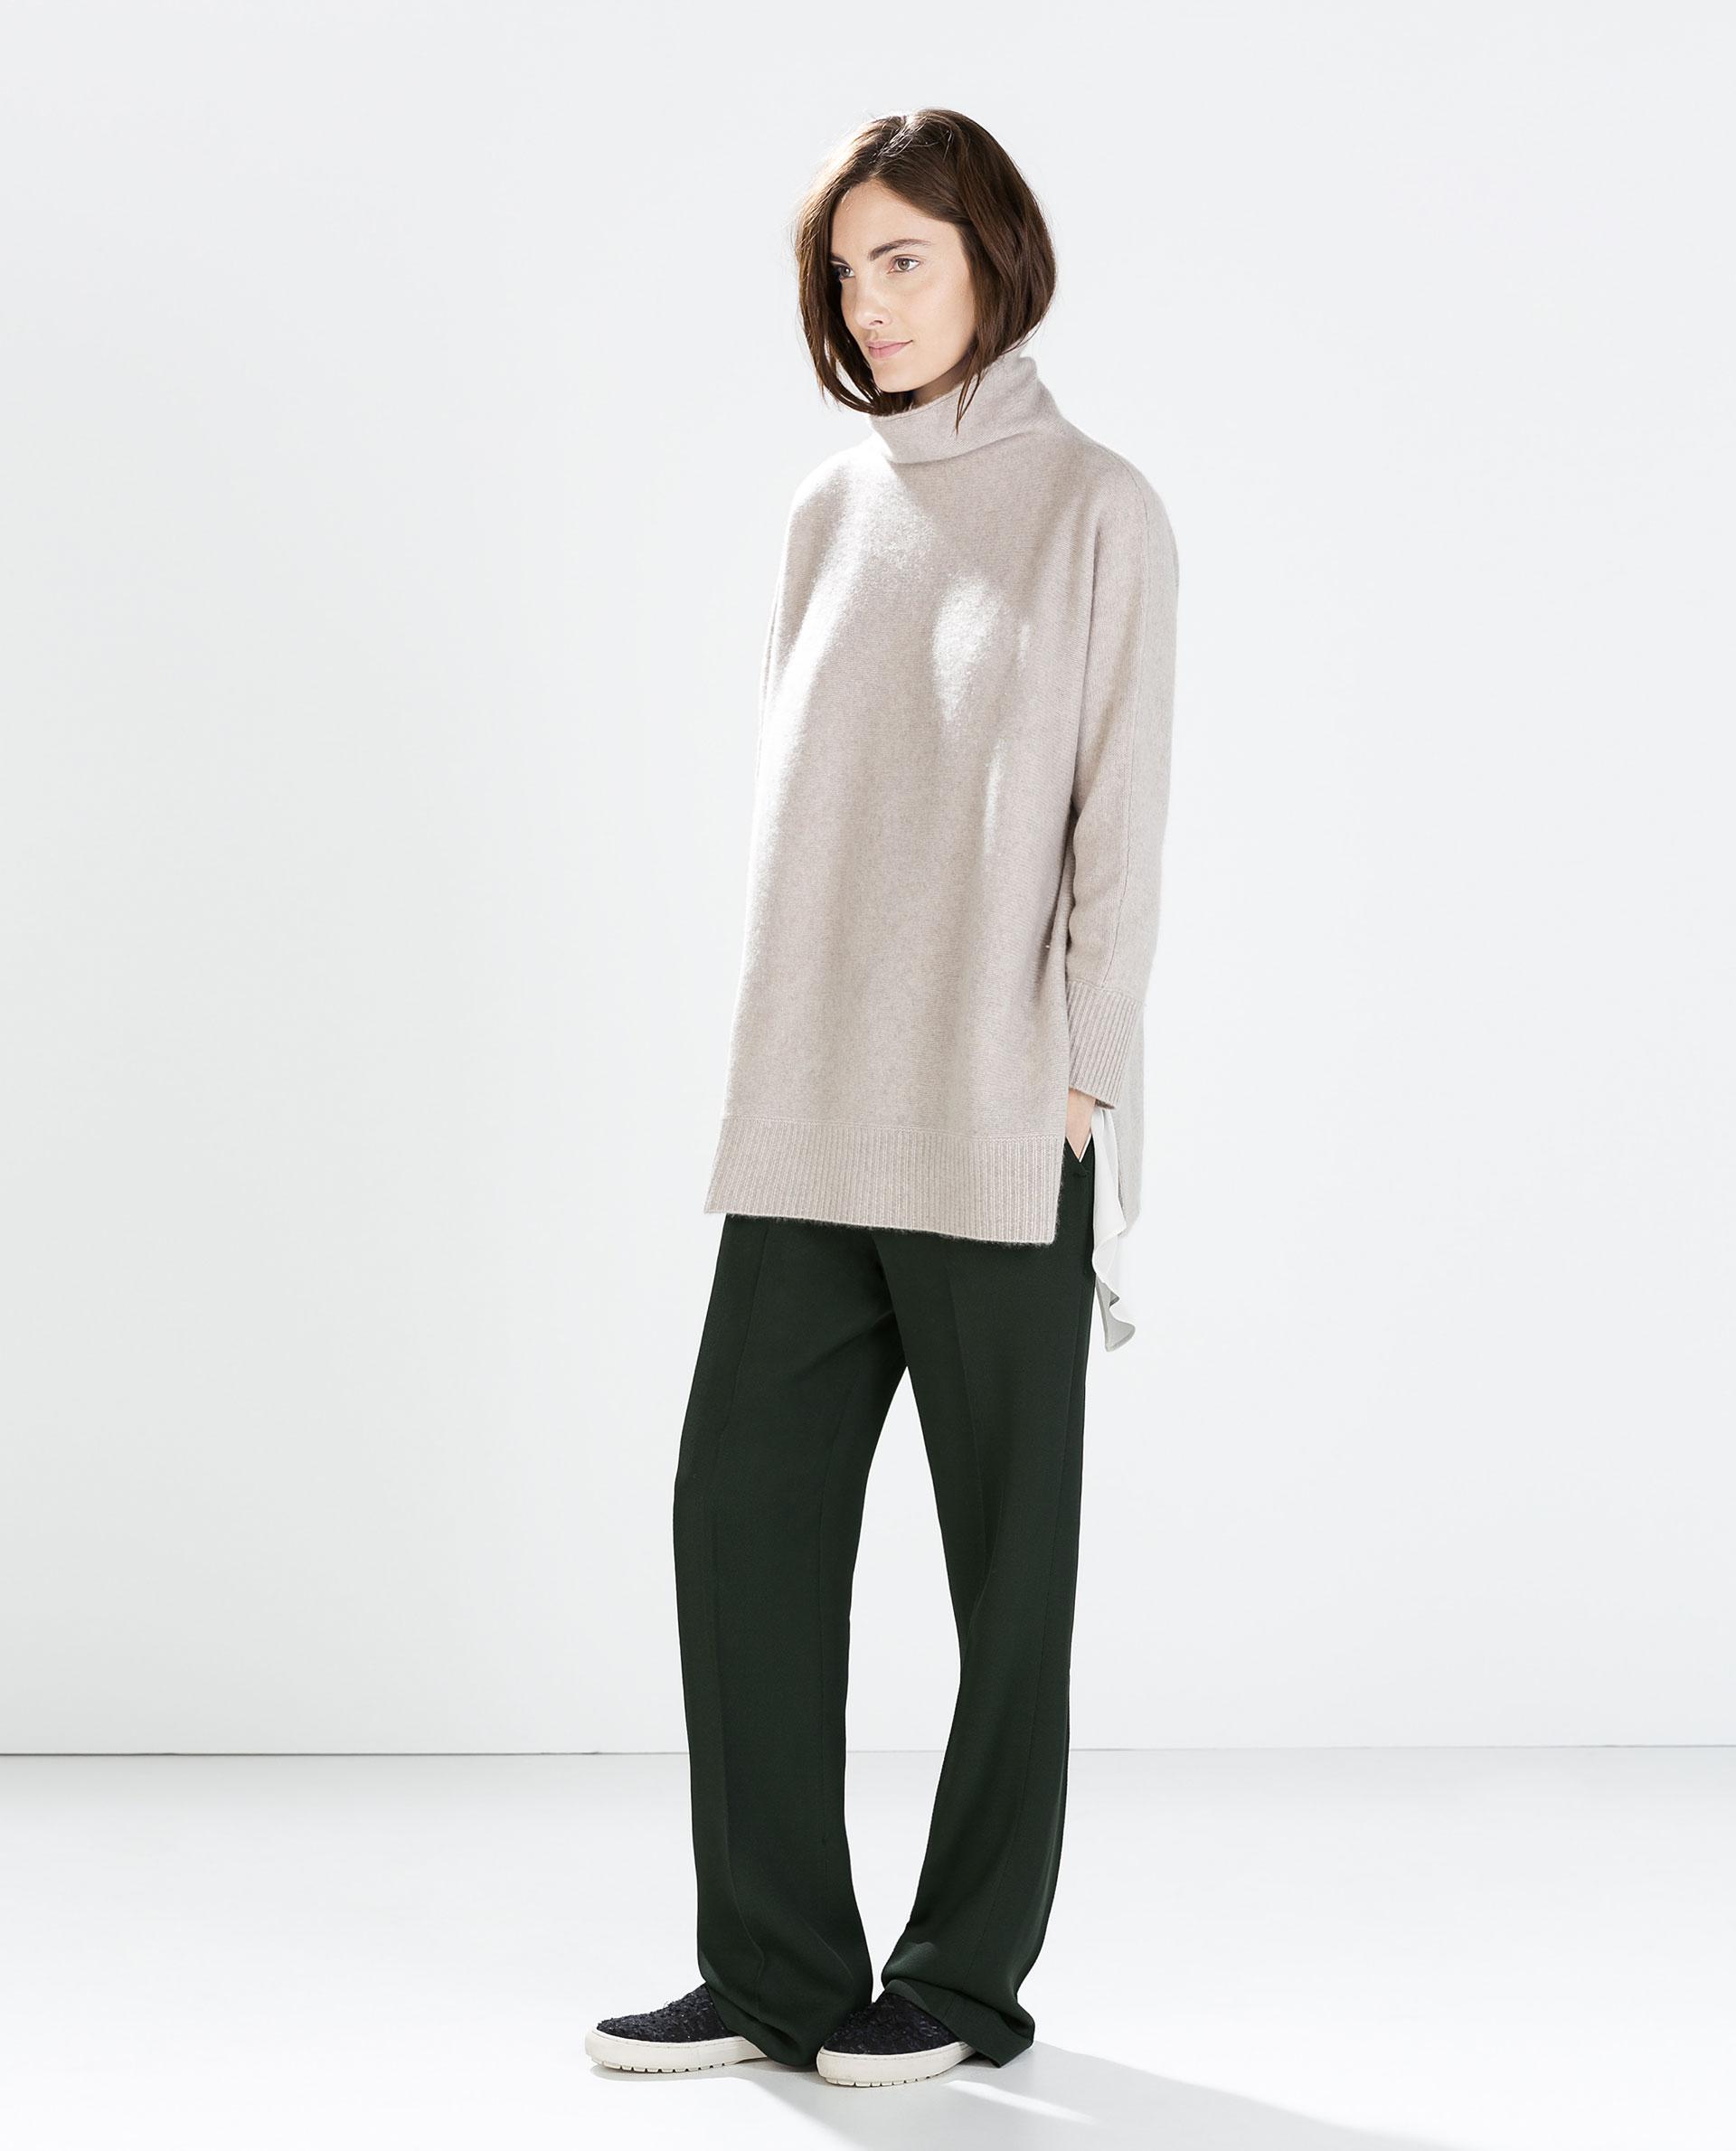 Zara Cashmere Sweater 30